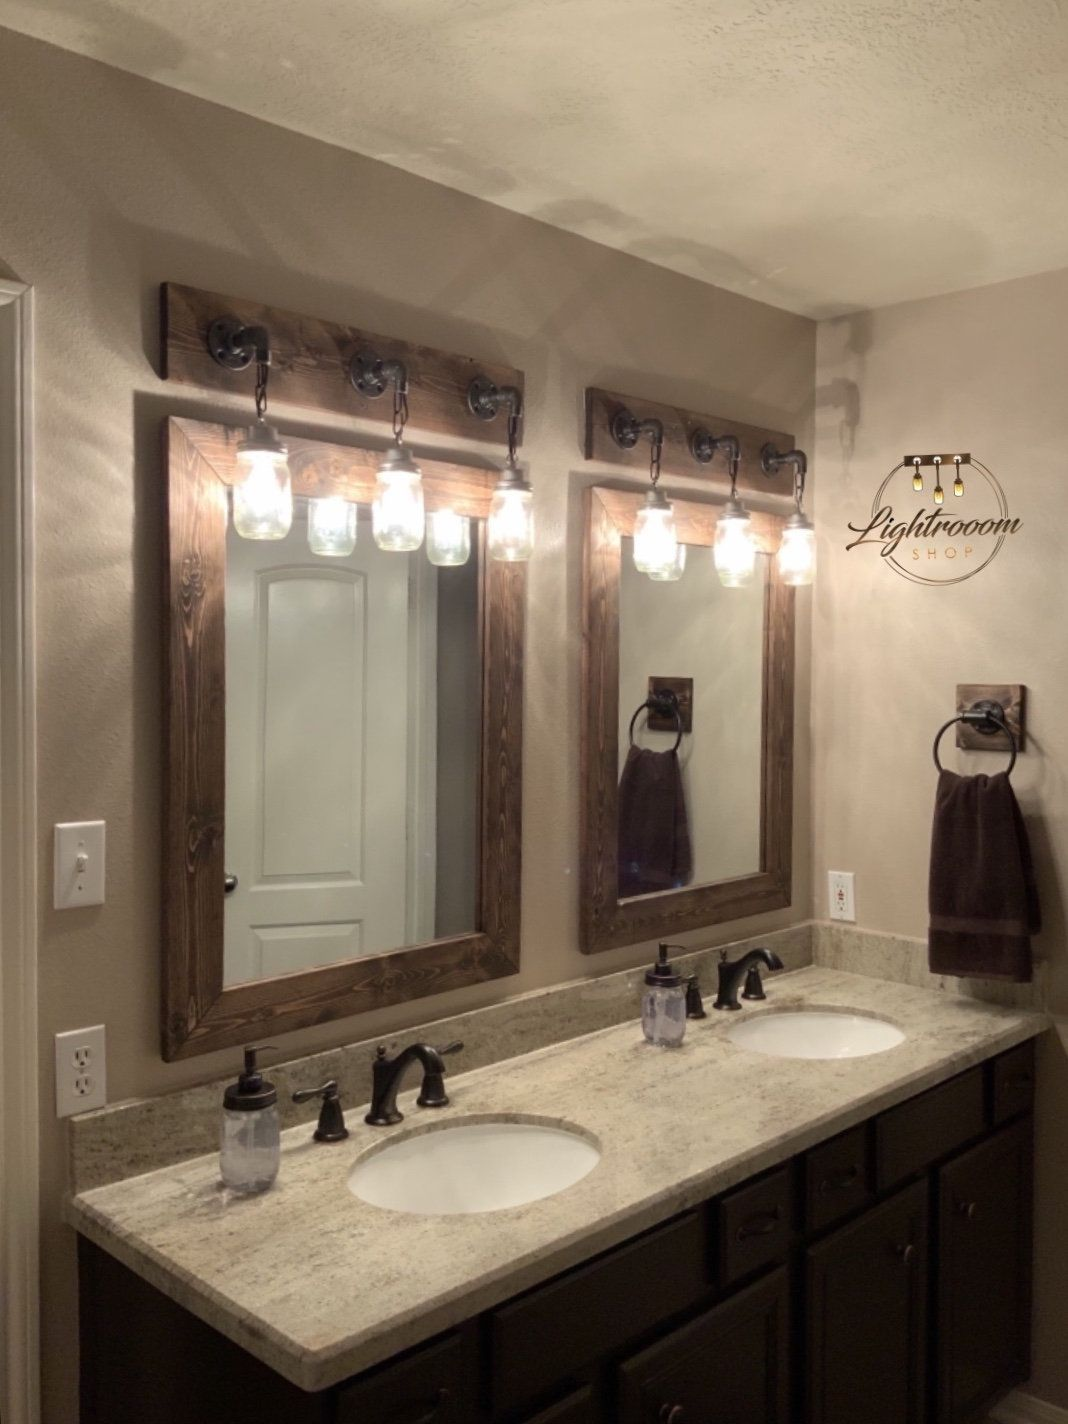 Dark Walnut Set Of Mirrors Double Sink Mirrors 2 Mirrors Bathroom Mirror Double Vanity Mi Large Bathroom Mirrors Bathroom Mirrors Diy Bathroom Mirror Frame